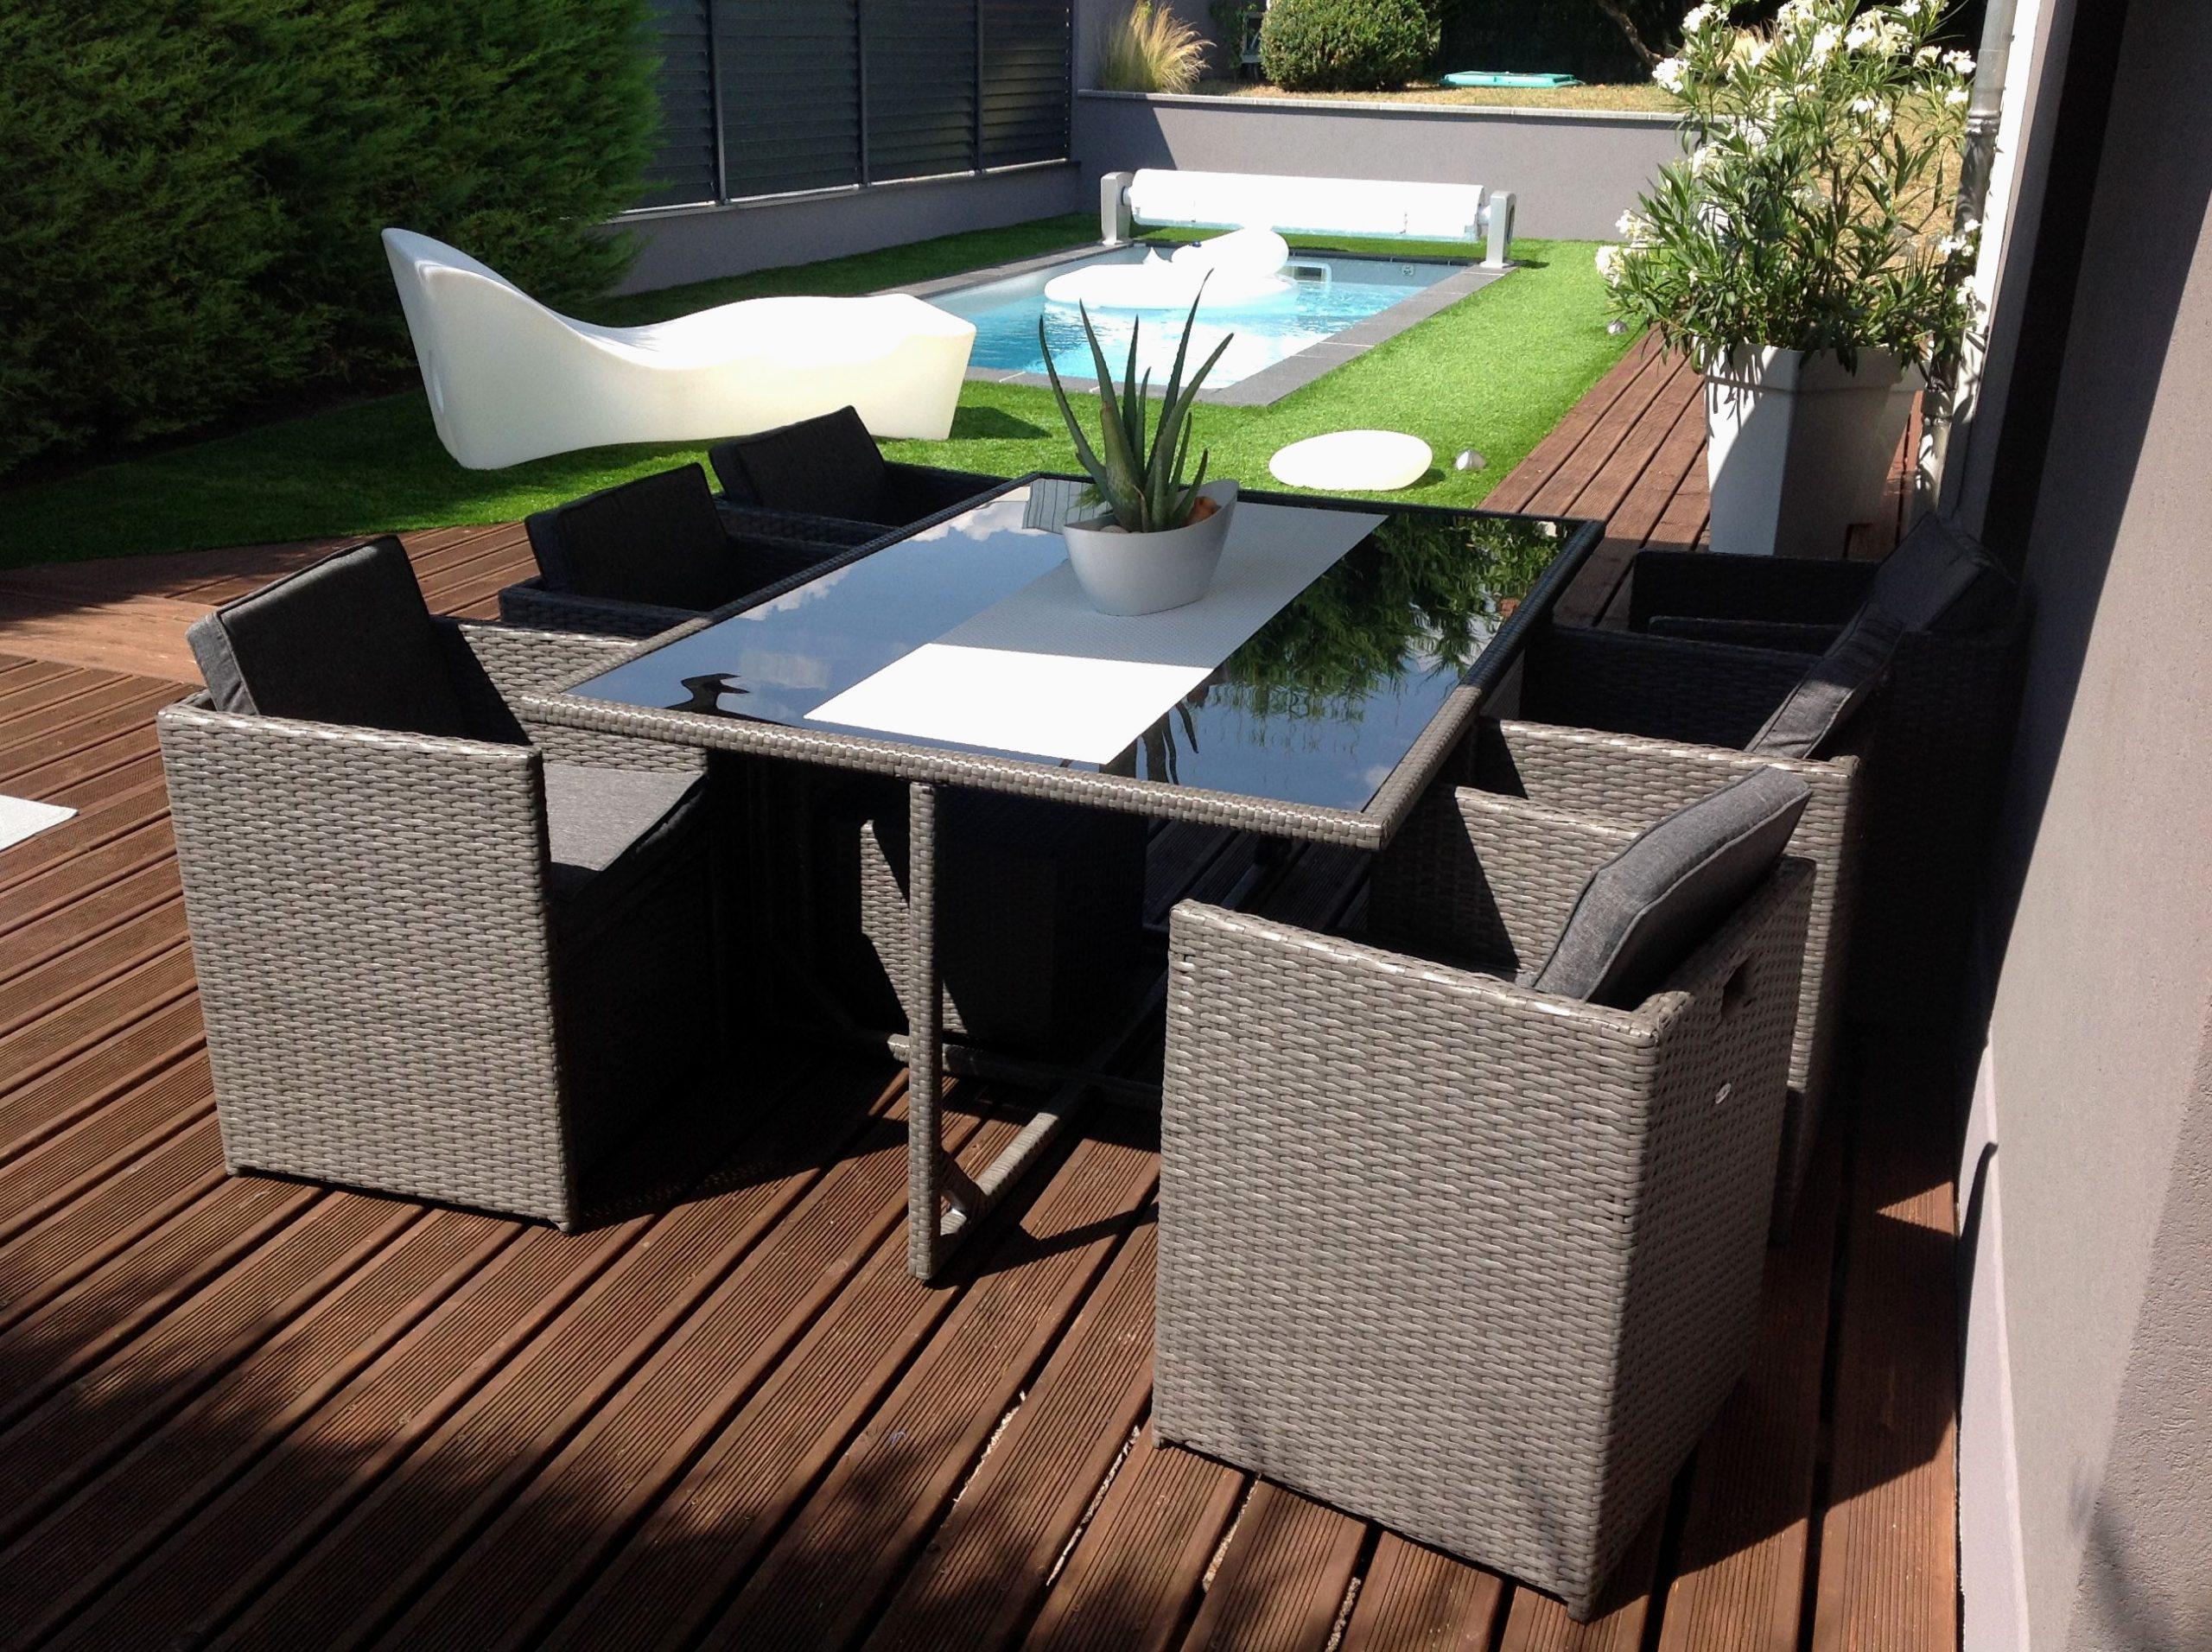 Destockage Mobilier Jardin Resine Tressee Fantastique Chaise ... serapportantà Salon De Jardin Resine Occasion